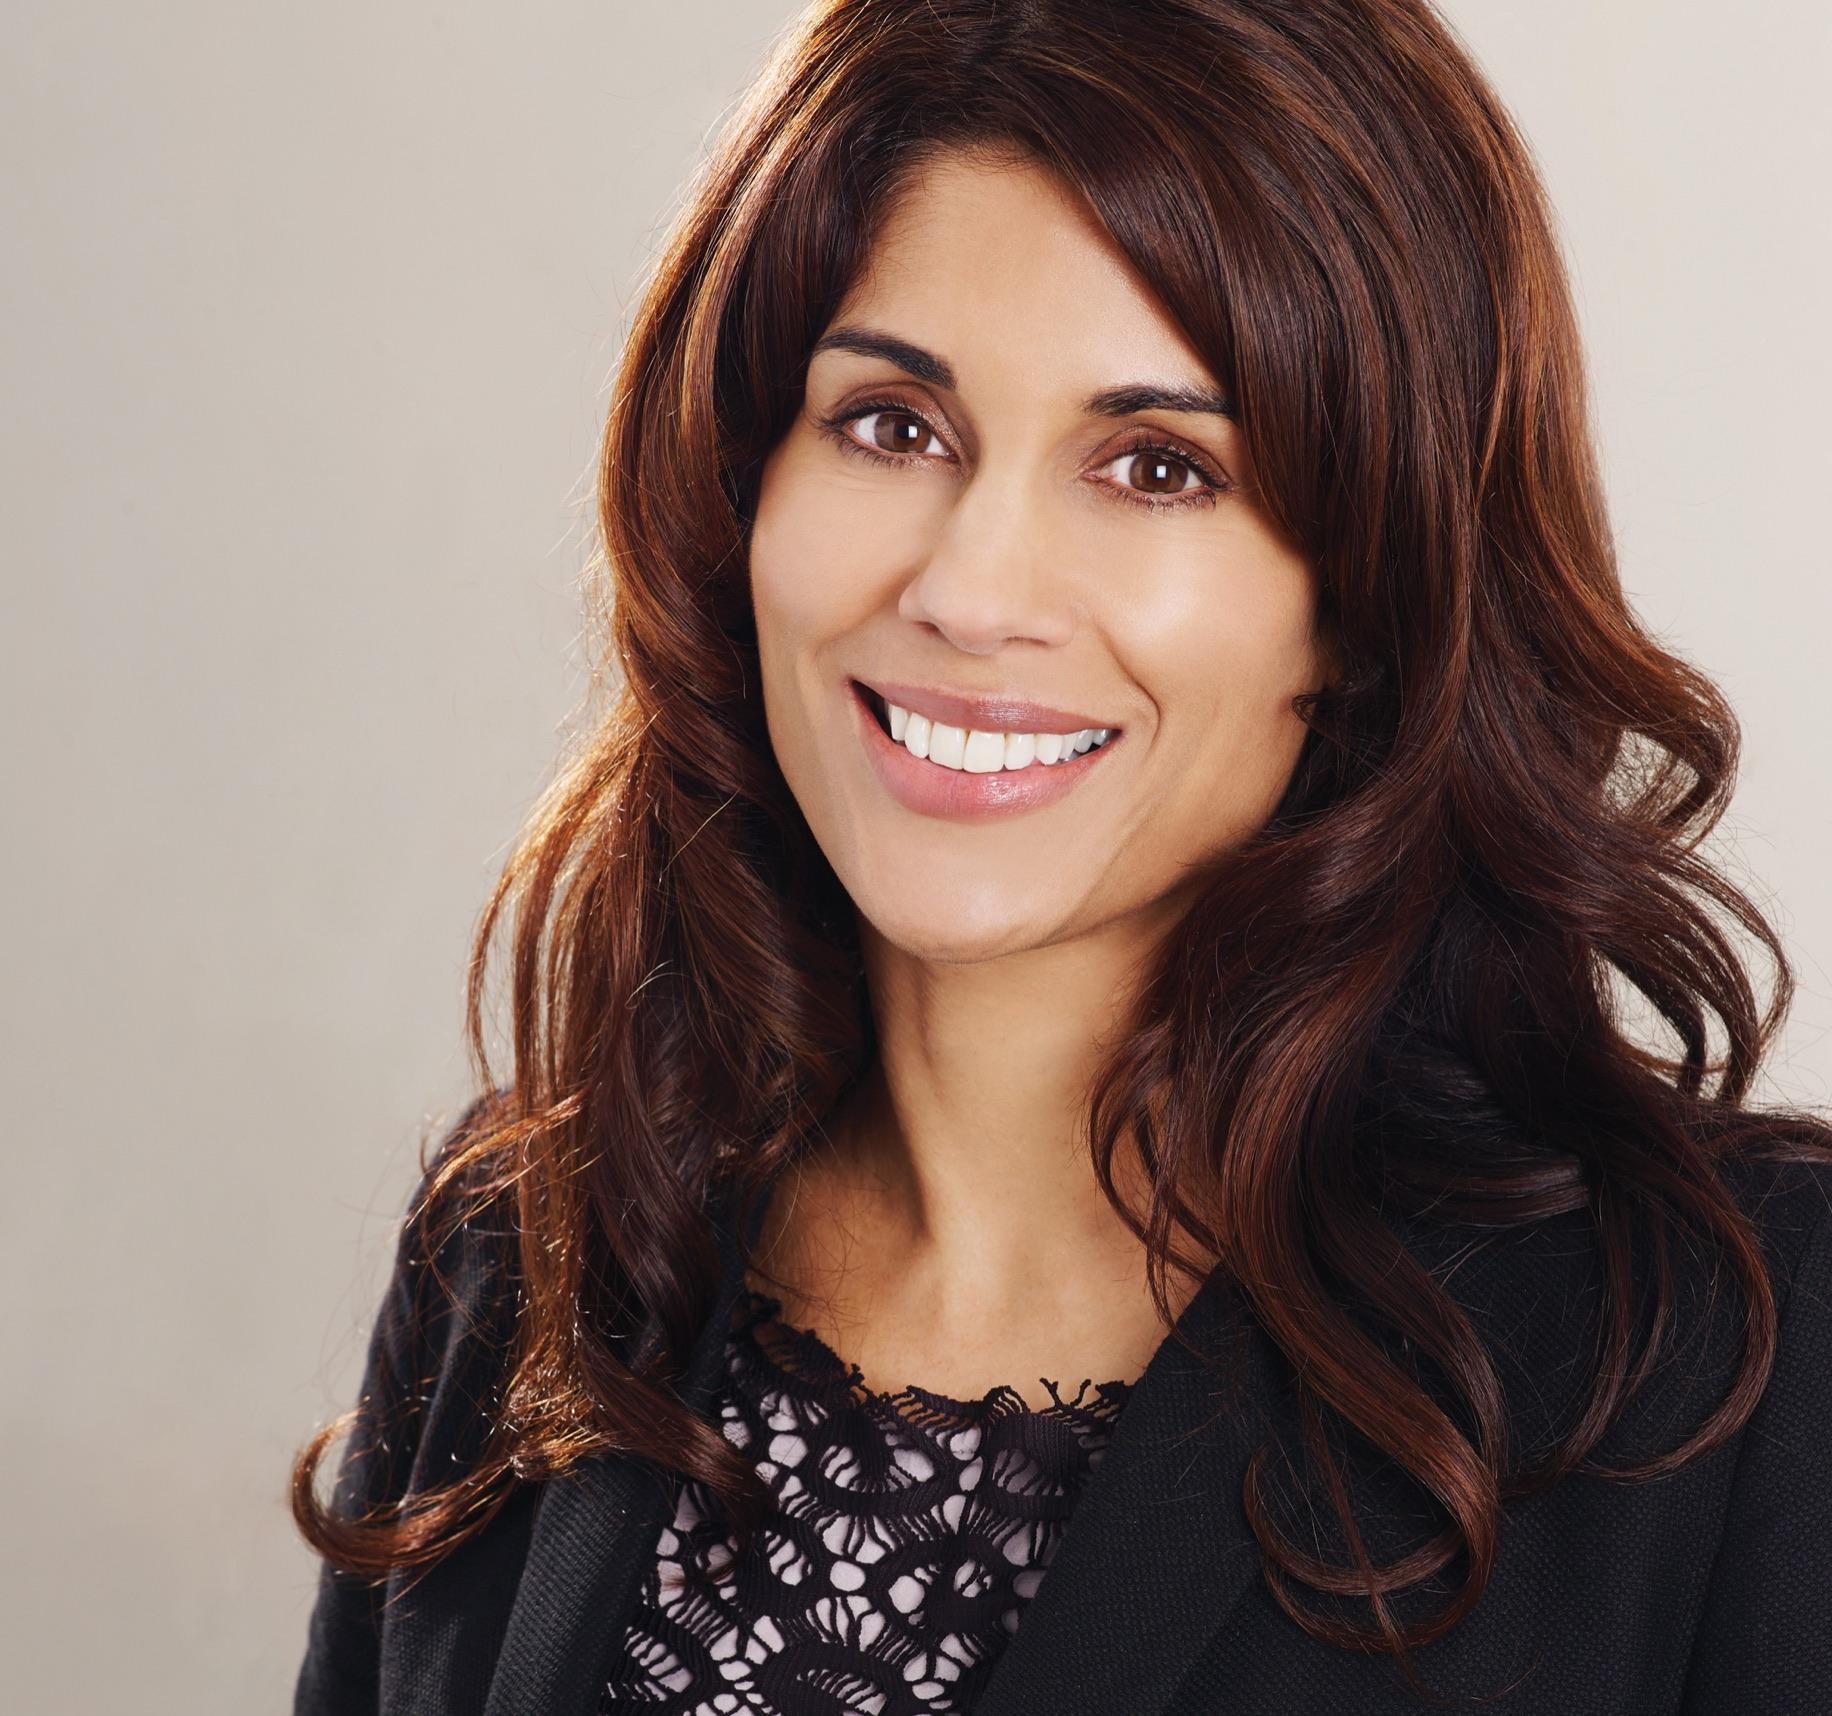 Introducing Anna Persaud